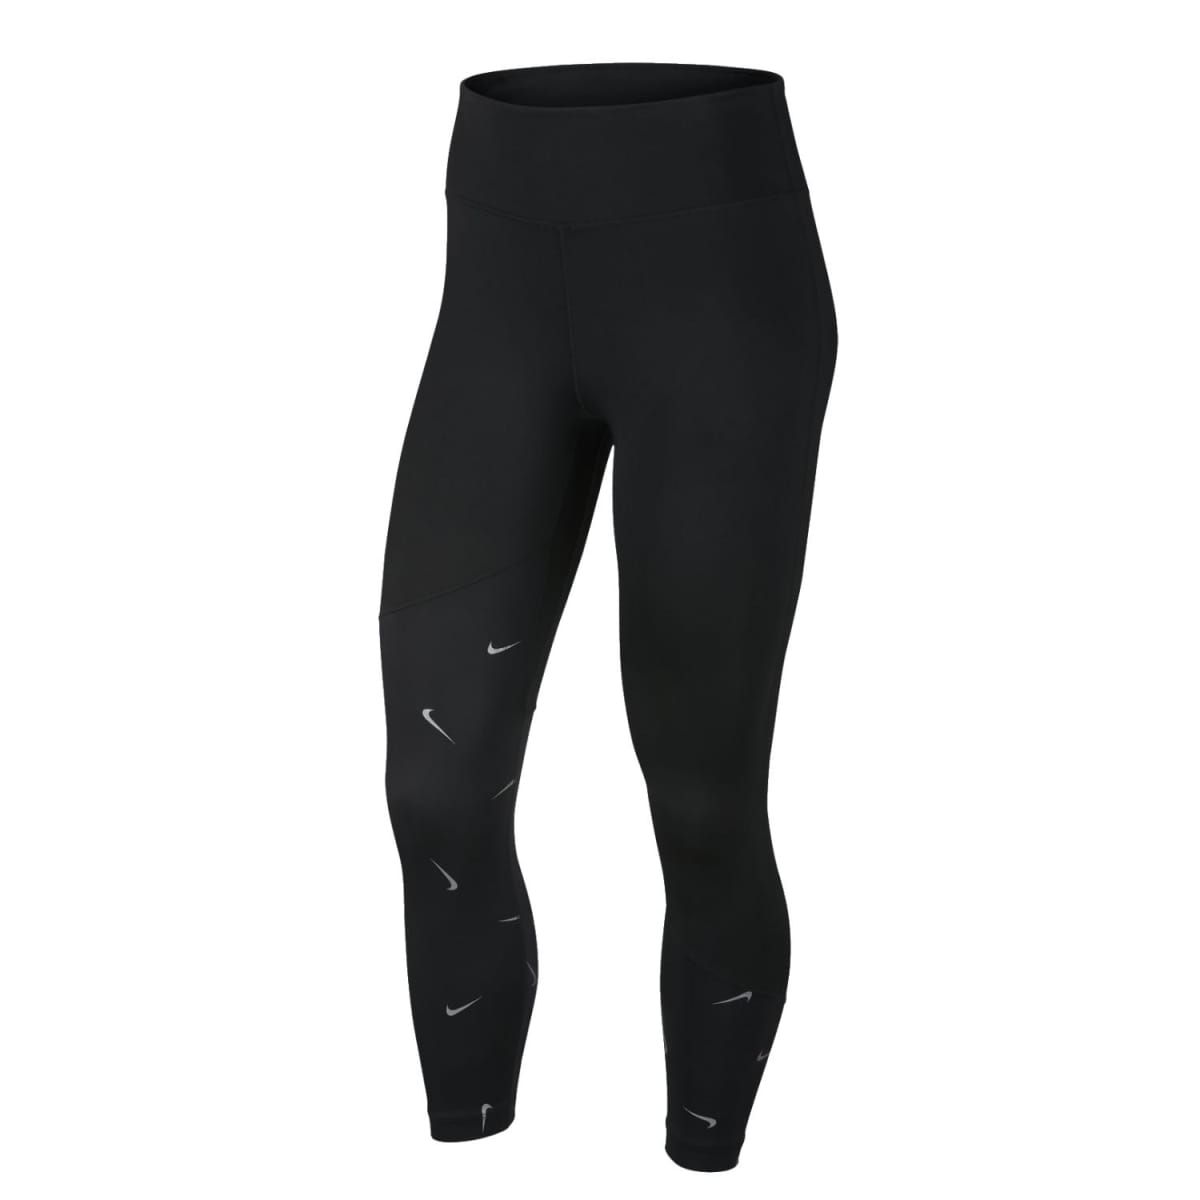 9ecc1111966b5 Activewear   Tights   Sportsmans Warehouse